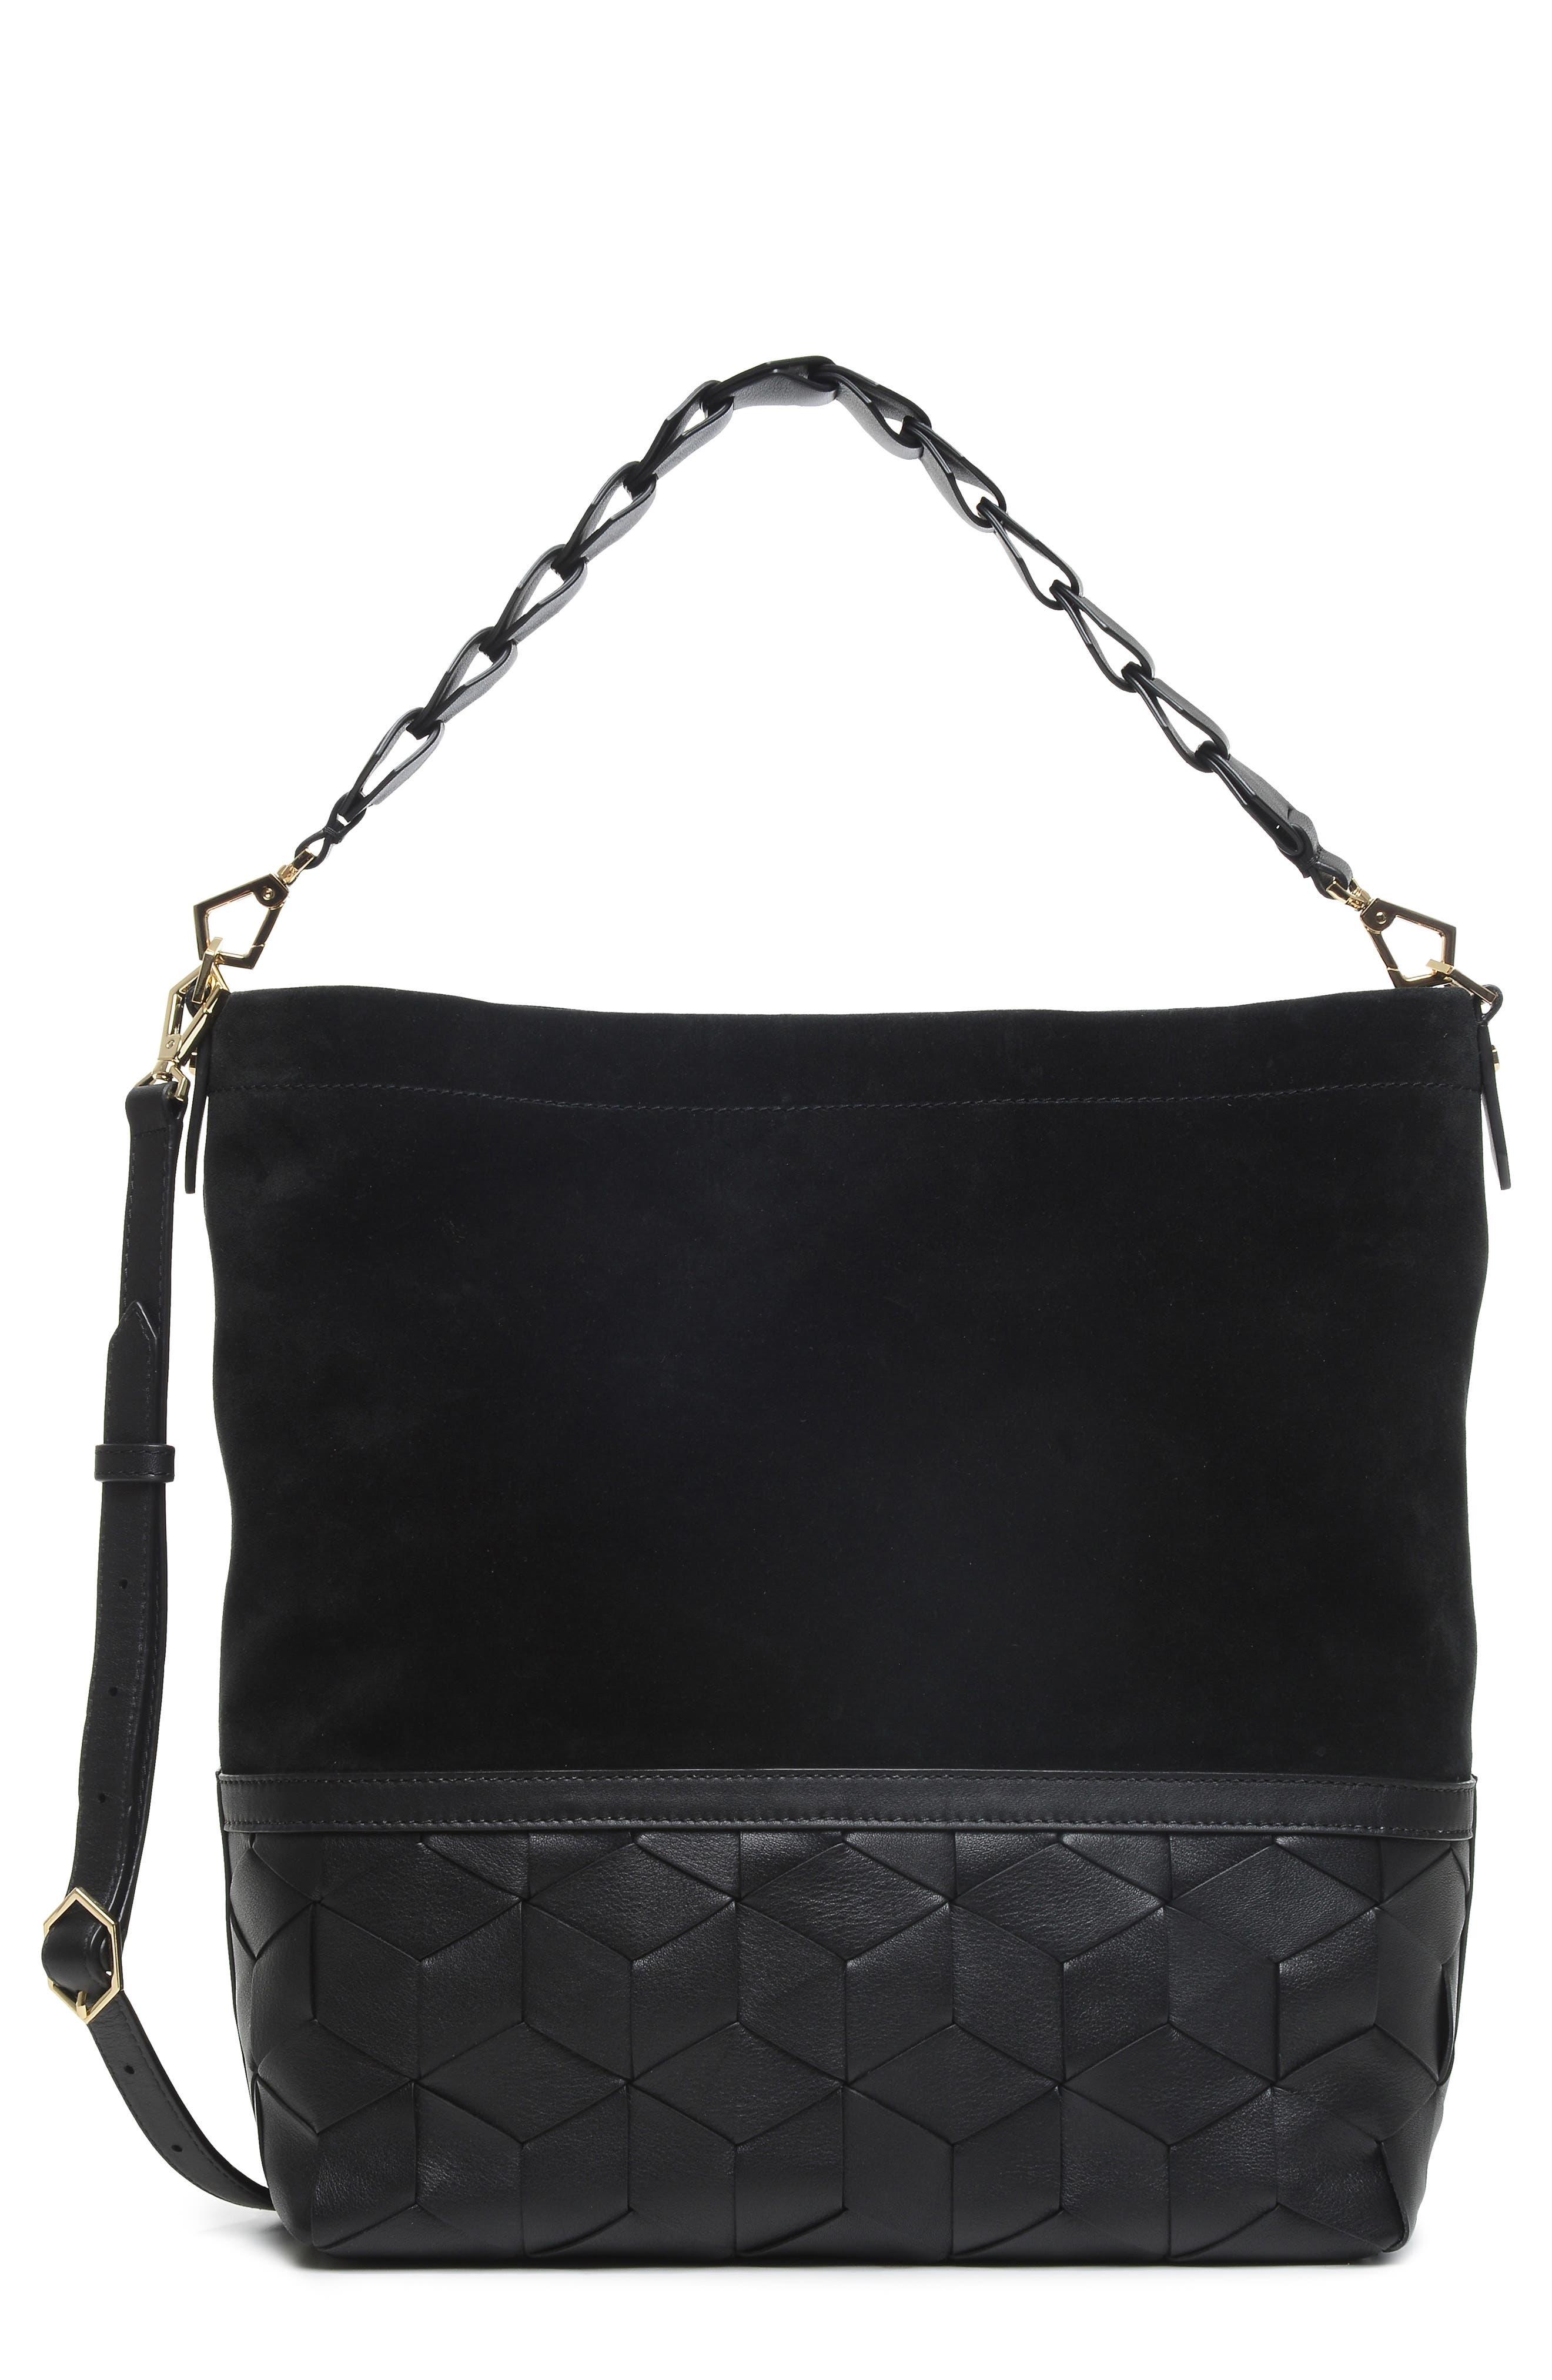 Promenade Leather & Suede Bucket Bag,                             Main thumbnail 1, color,                             001